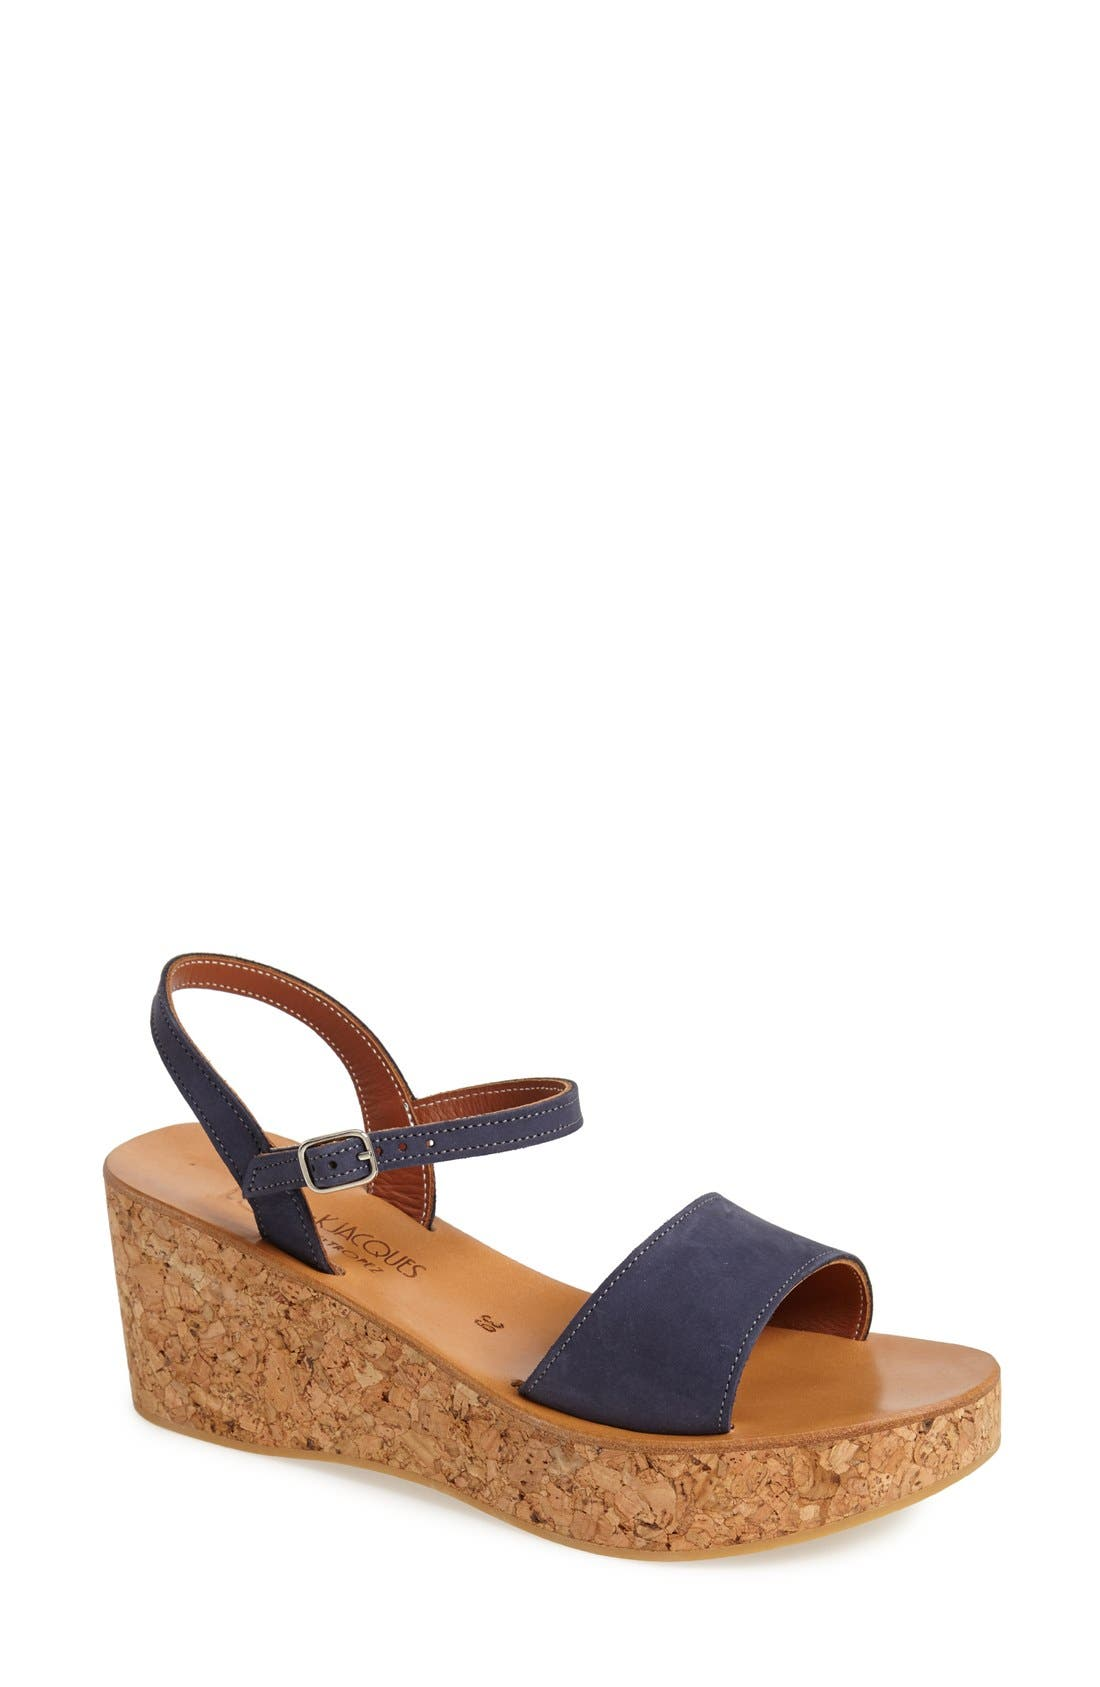 Main Image - K.Jacques St. Tropez Ankle Strap Wedge Sandal (Women)